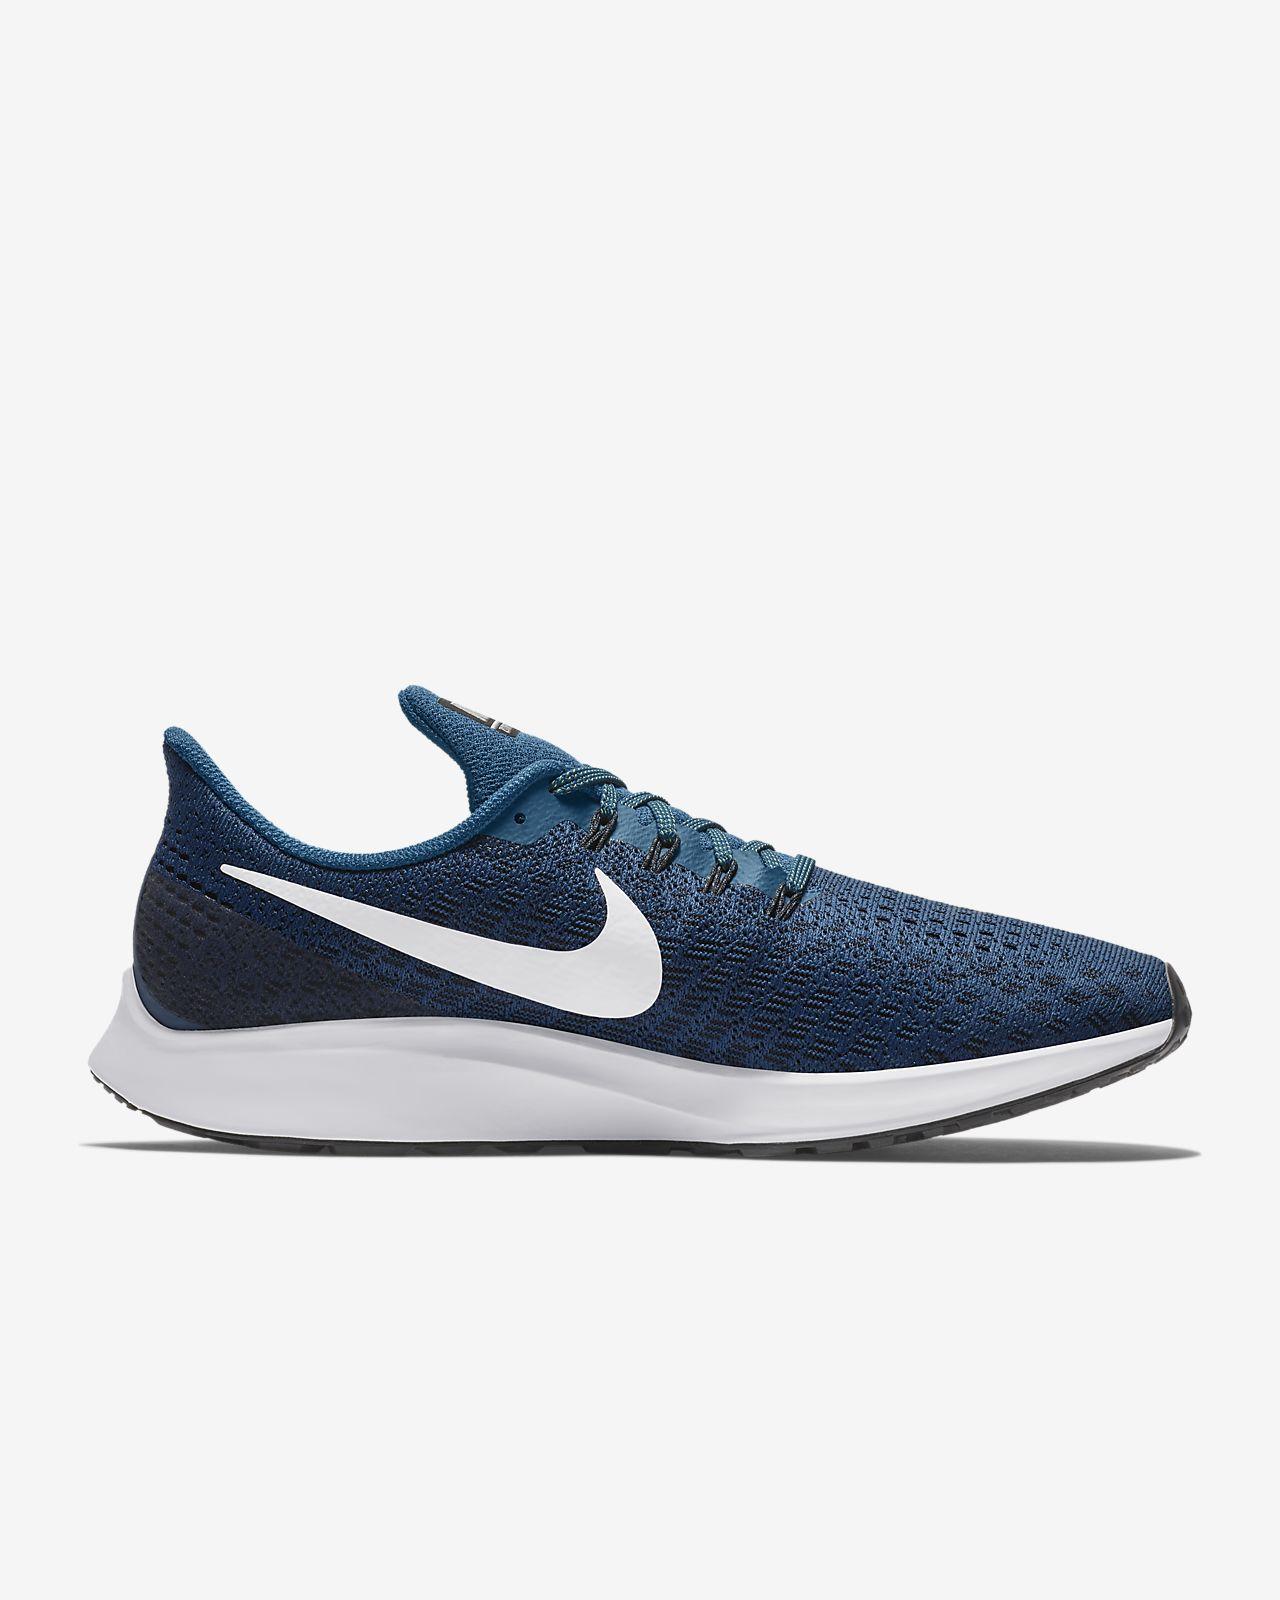 promo code ab541 2cf99 ... Chaussure de running Nike Air Zoom Pegasus 35 pour Homme